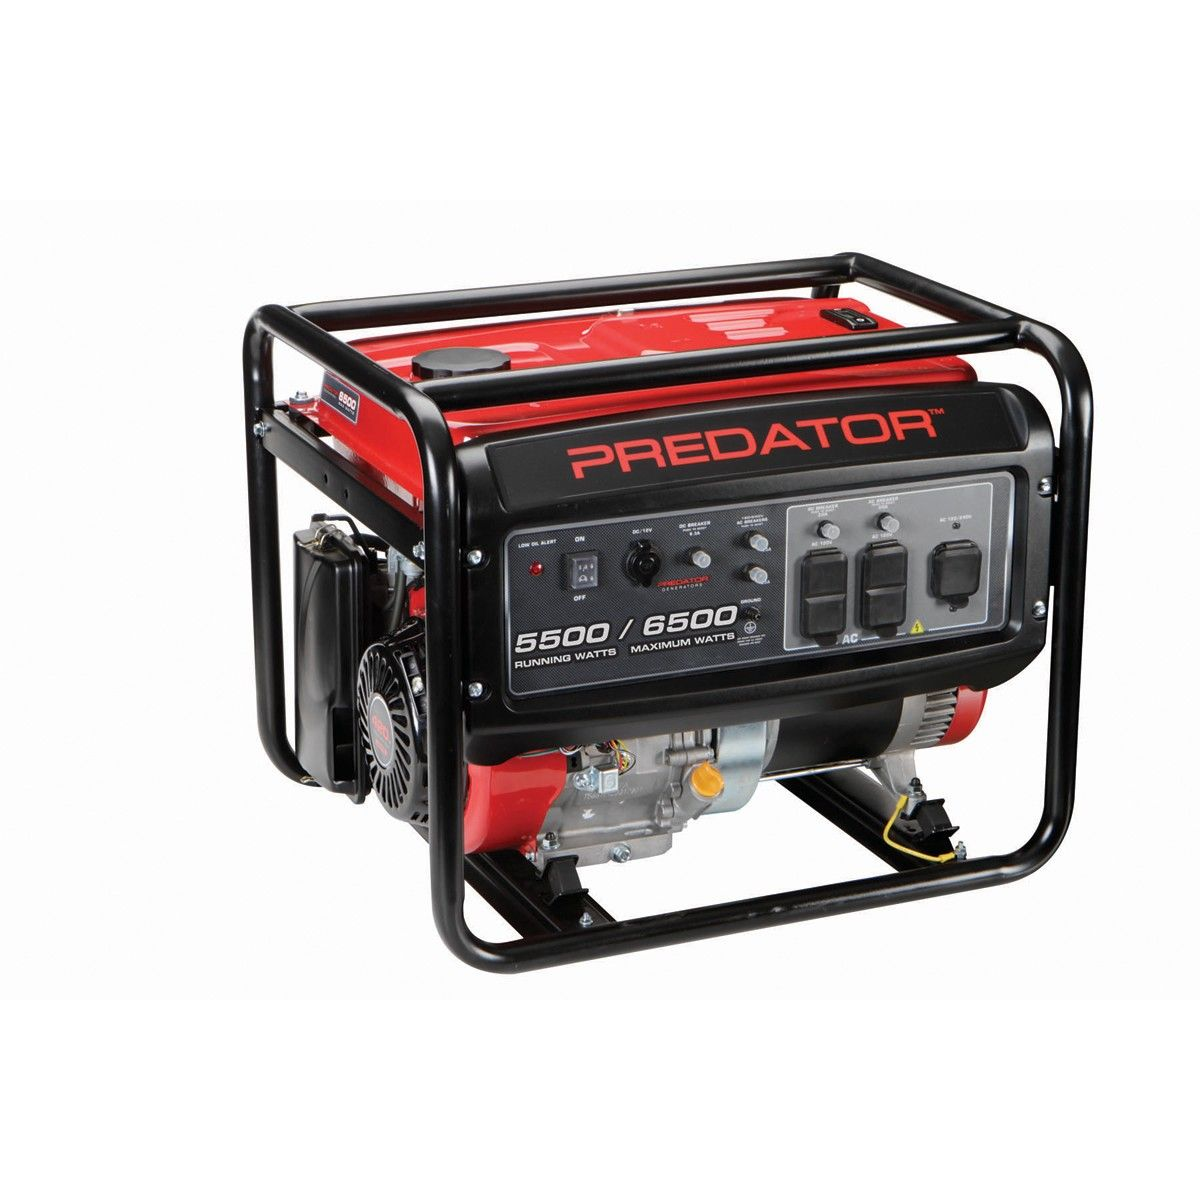 1dc55218995748c0d4946f422b7f9442 jpg onan 6500 generator wiring diagram diagram 1200 x 1200